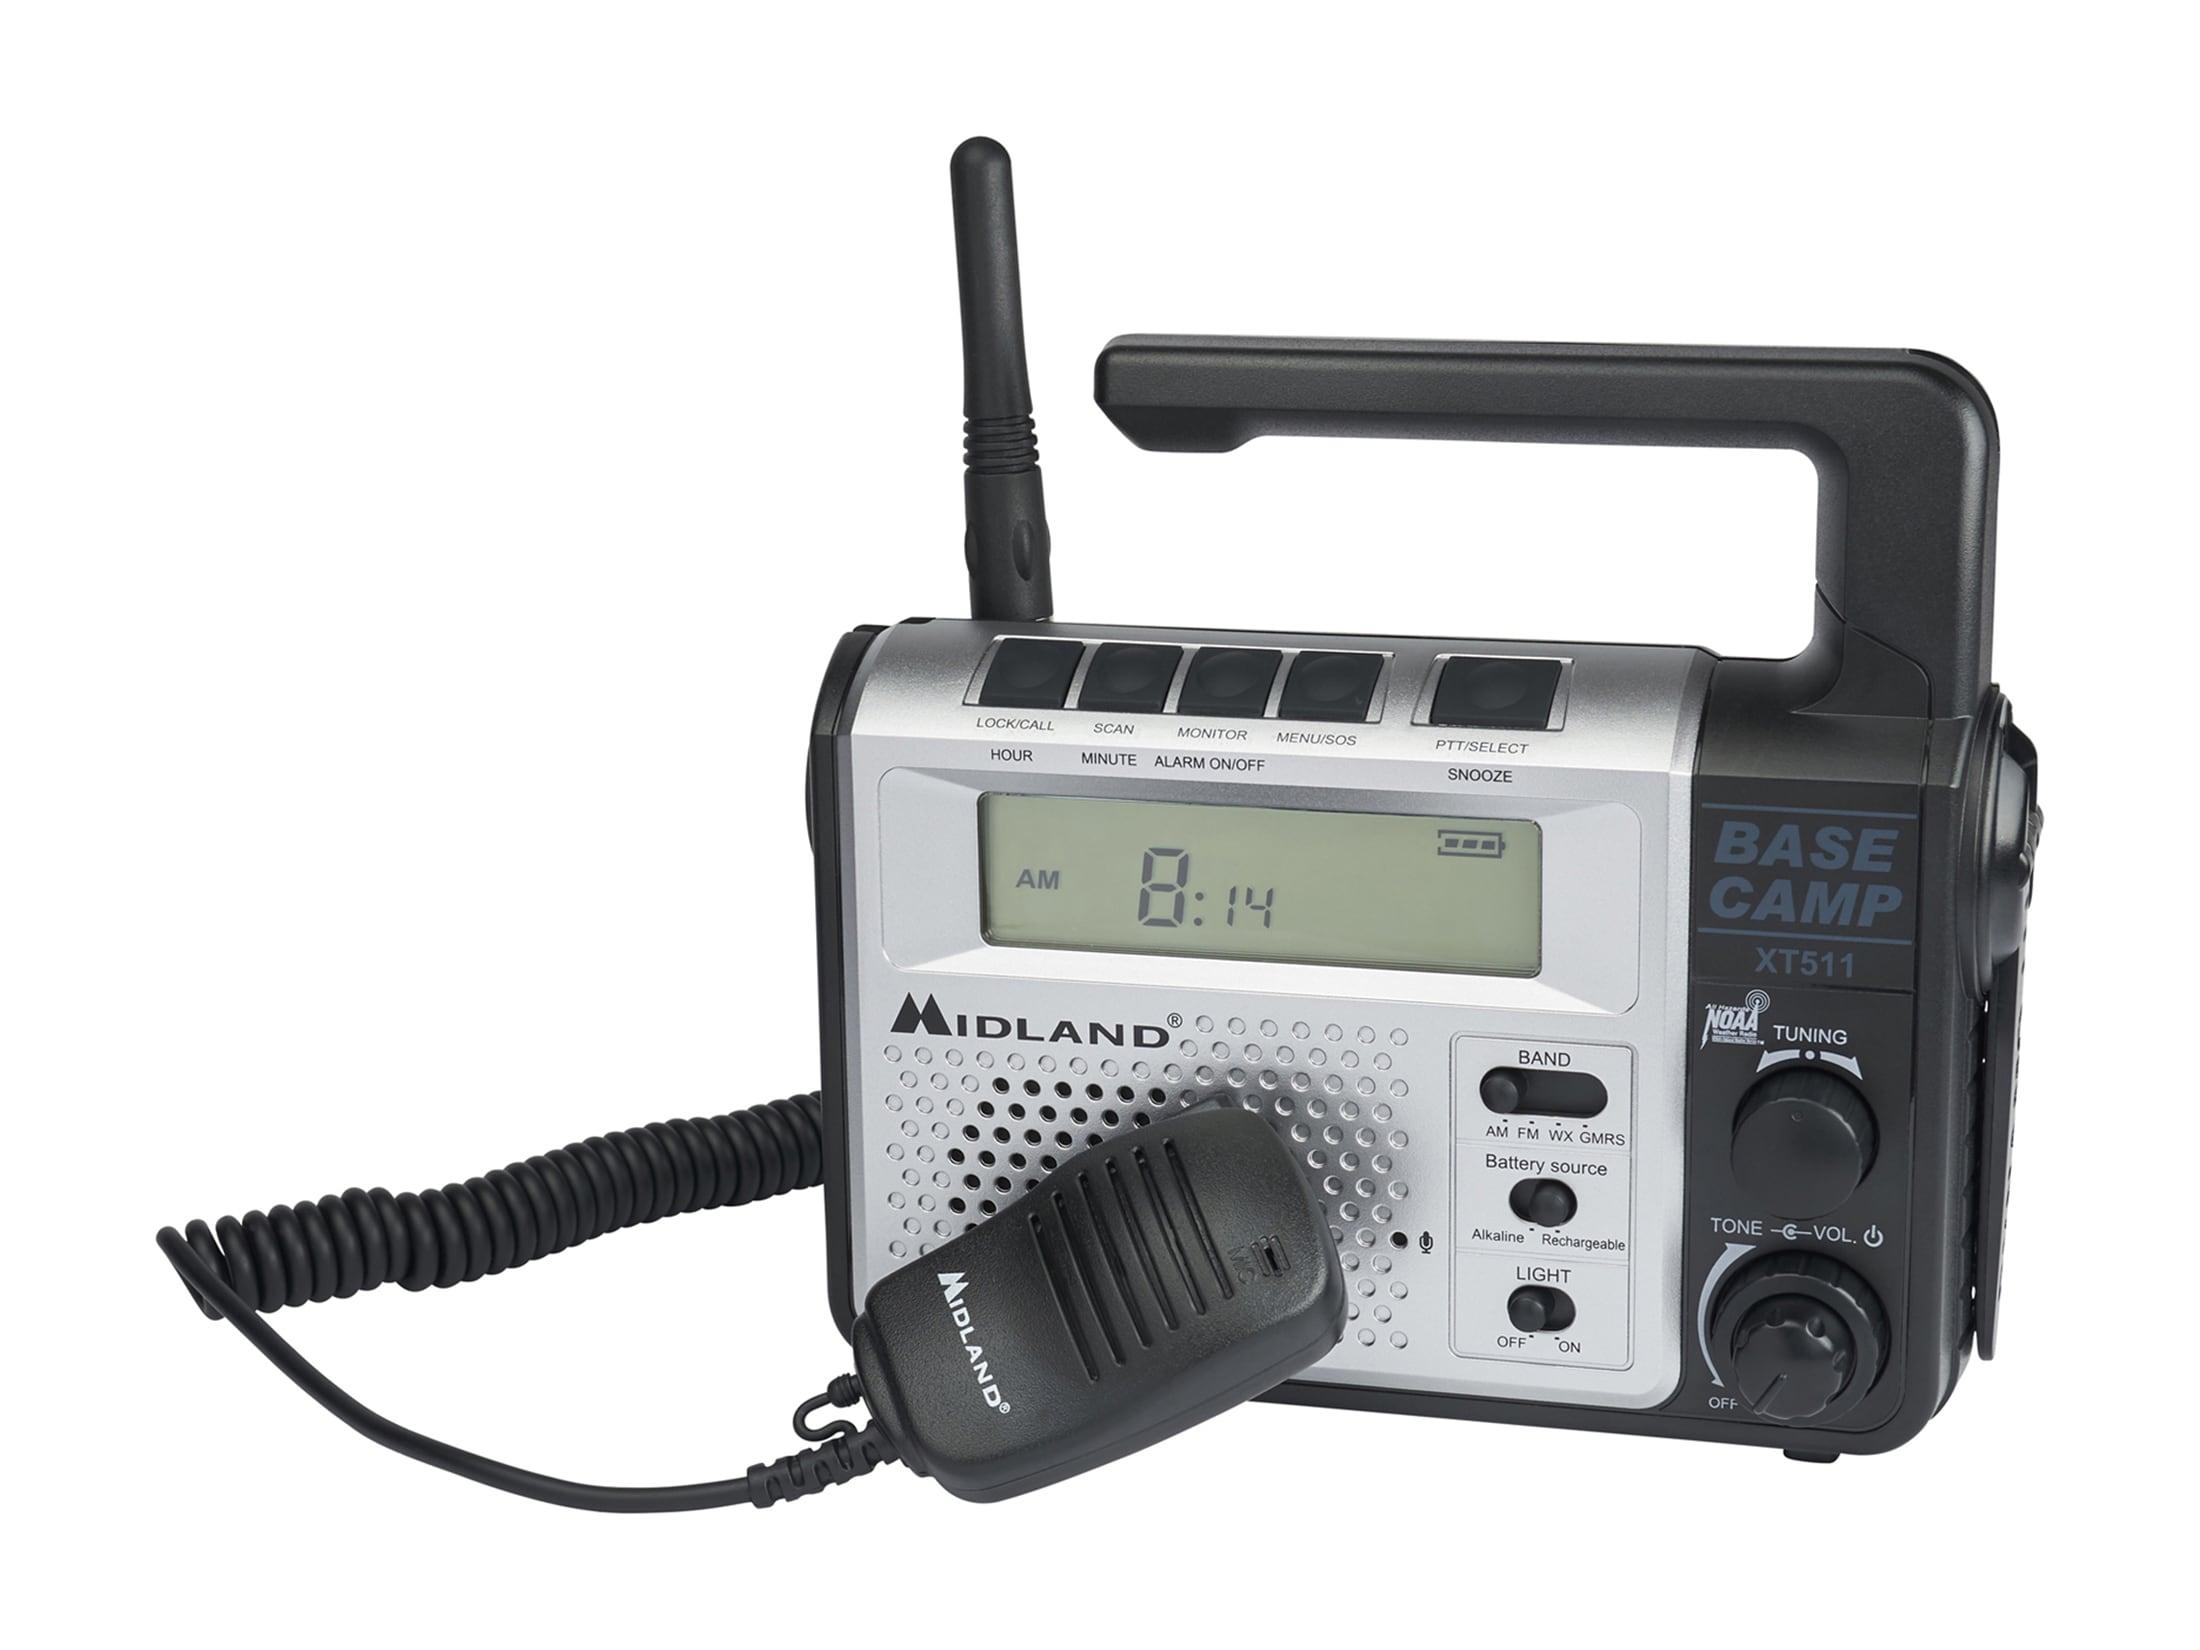 Midland XT511 Base Camp Radio NOAA Weather 22 Channel Silver Black